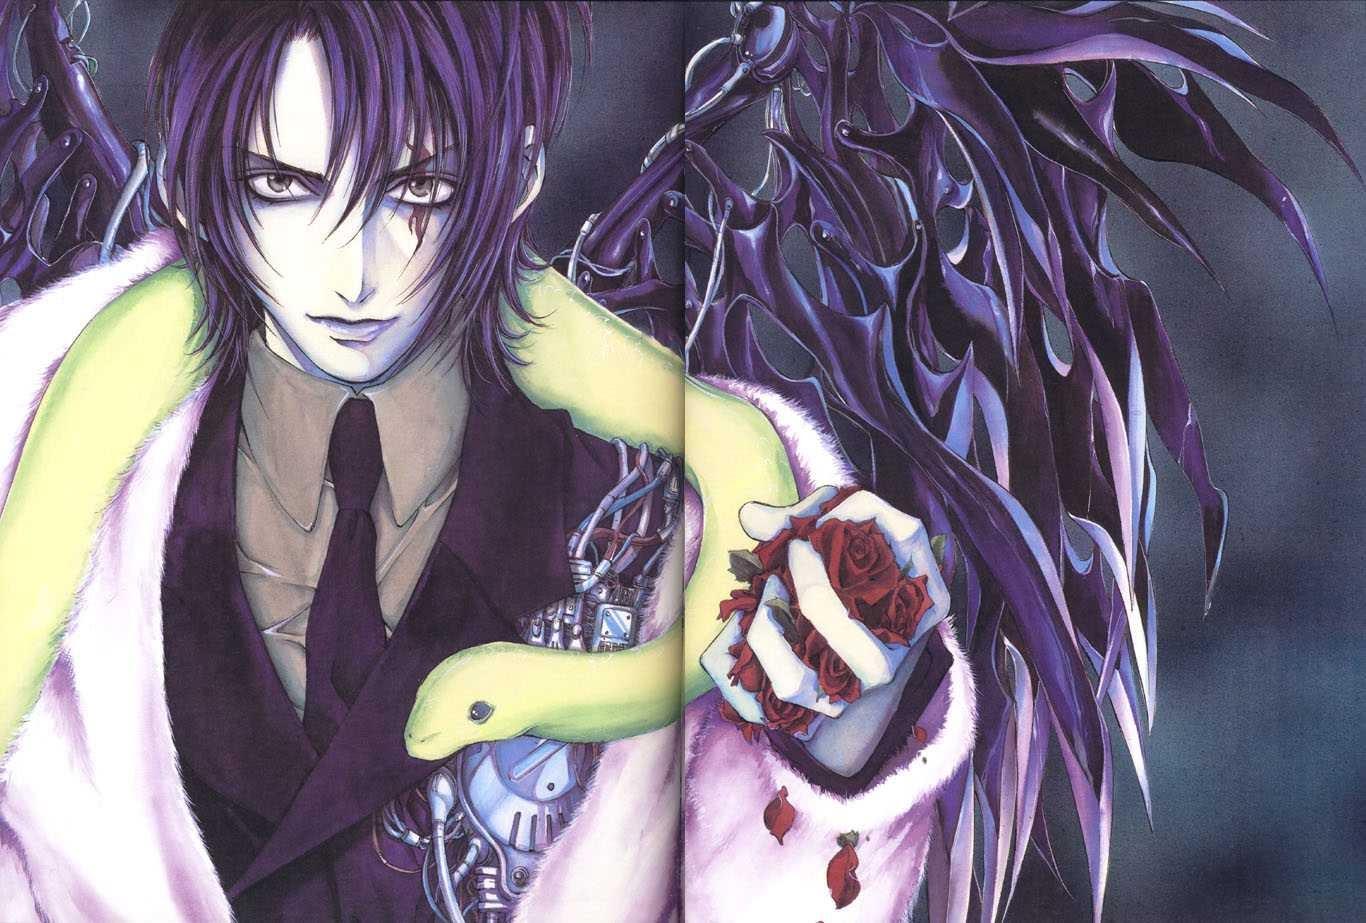 Anime Angel and Demon wallpaper 1080p (1366 x 923 ...